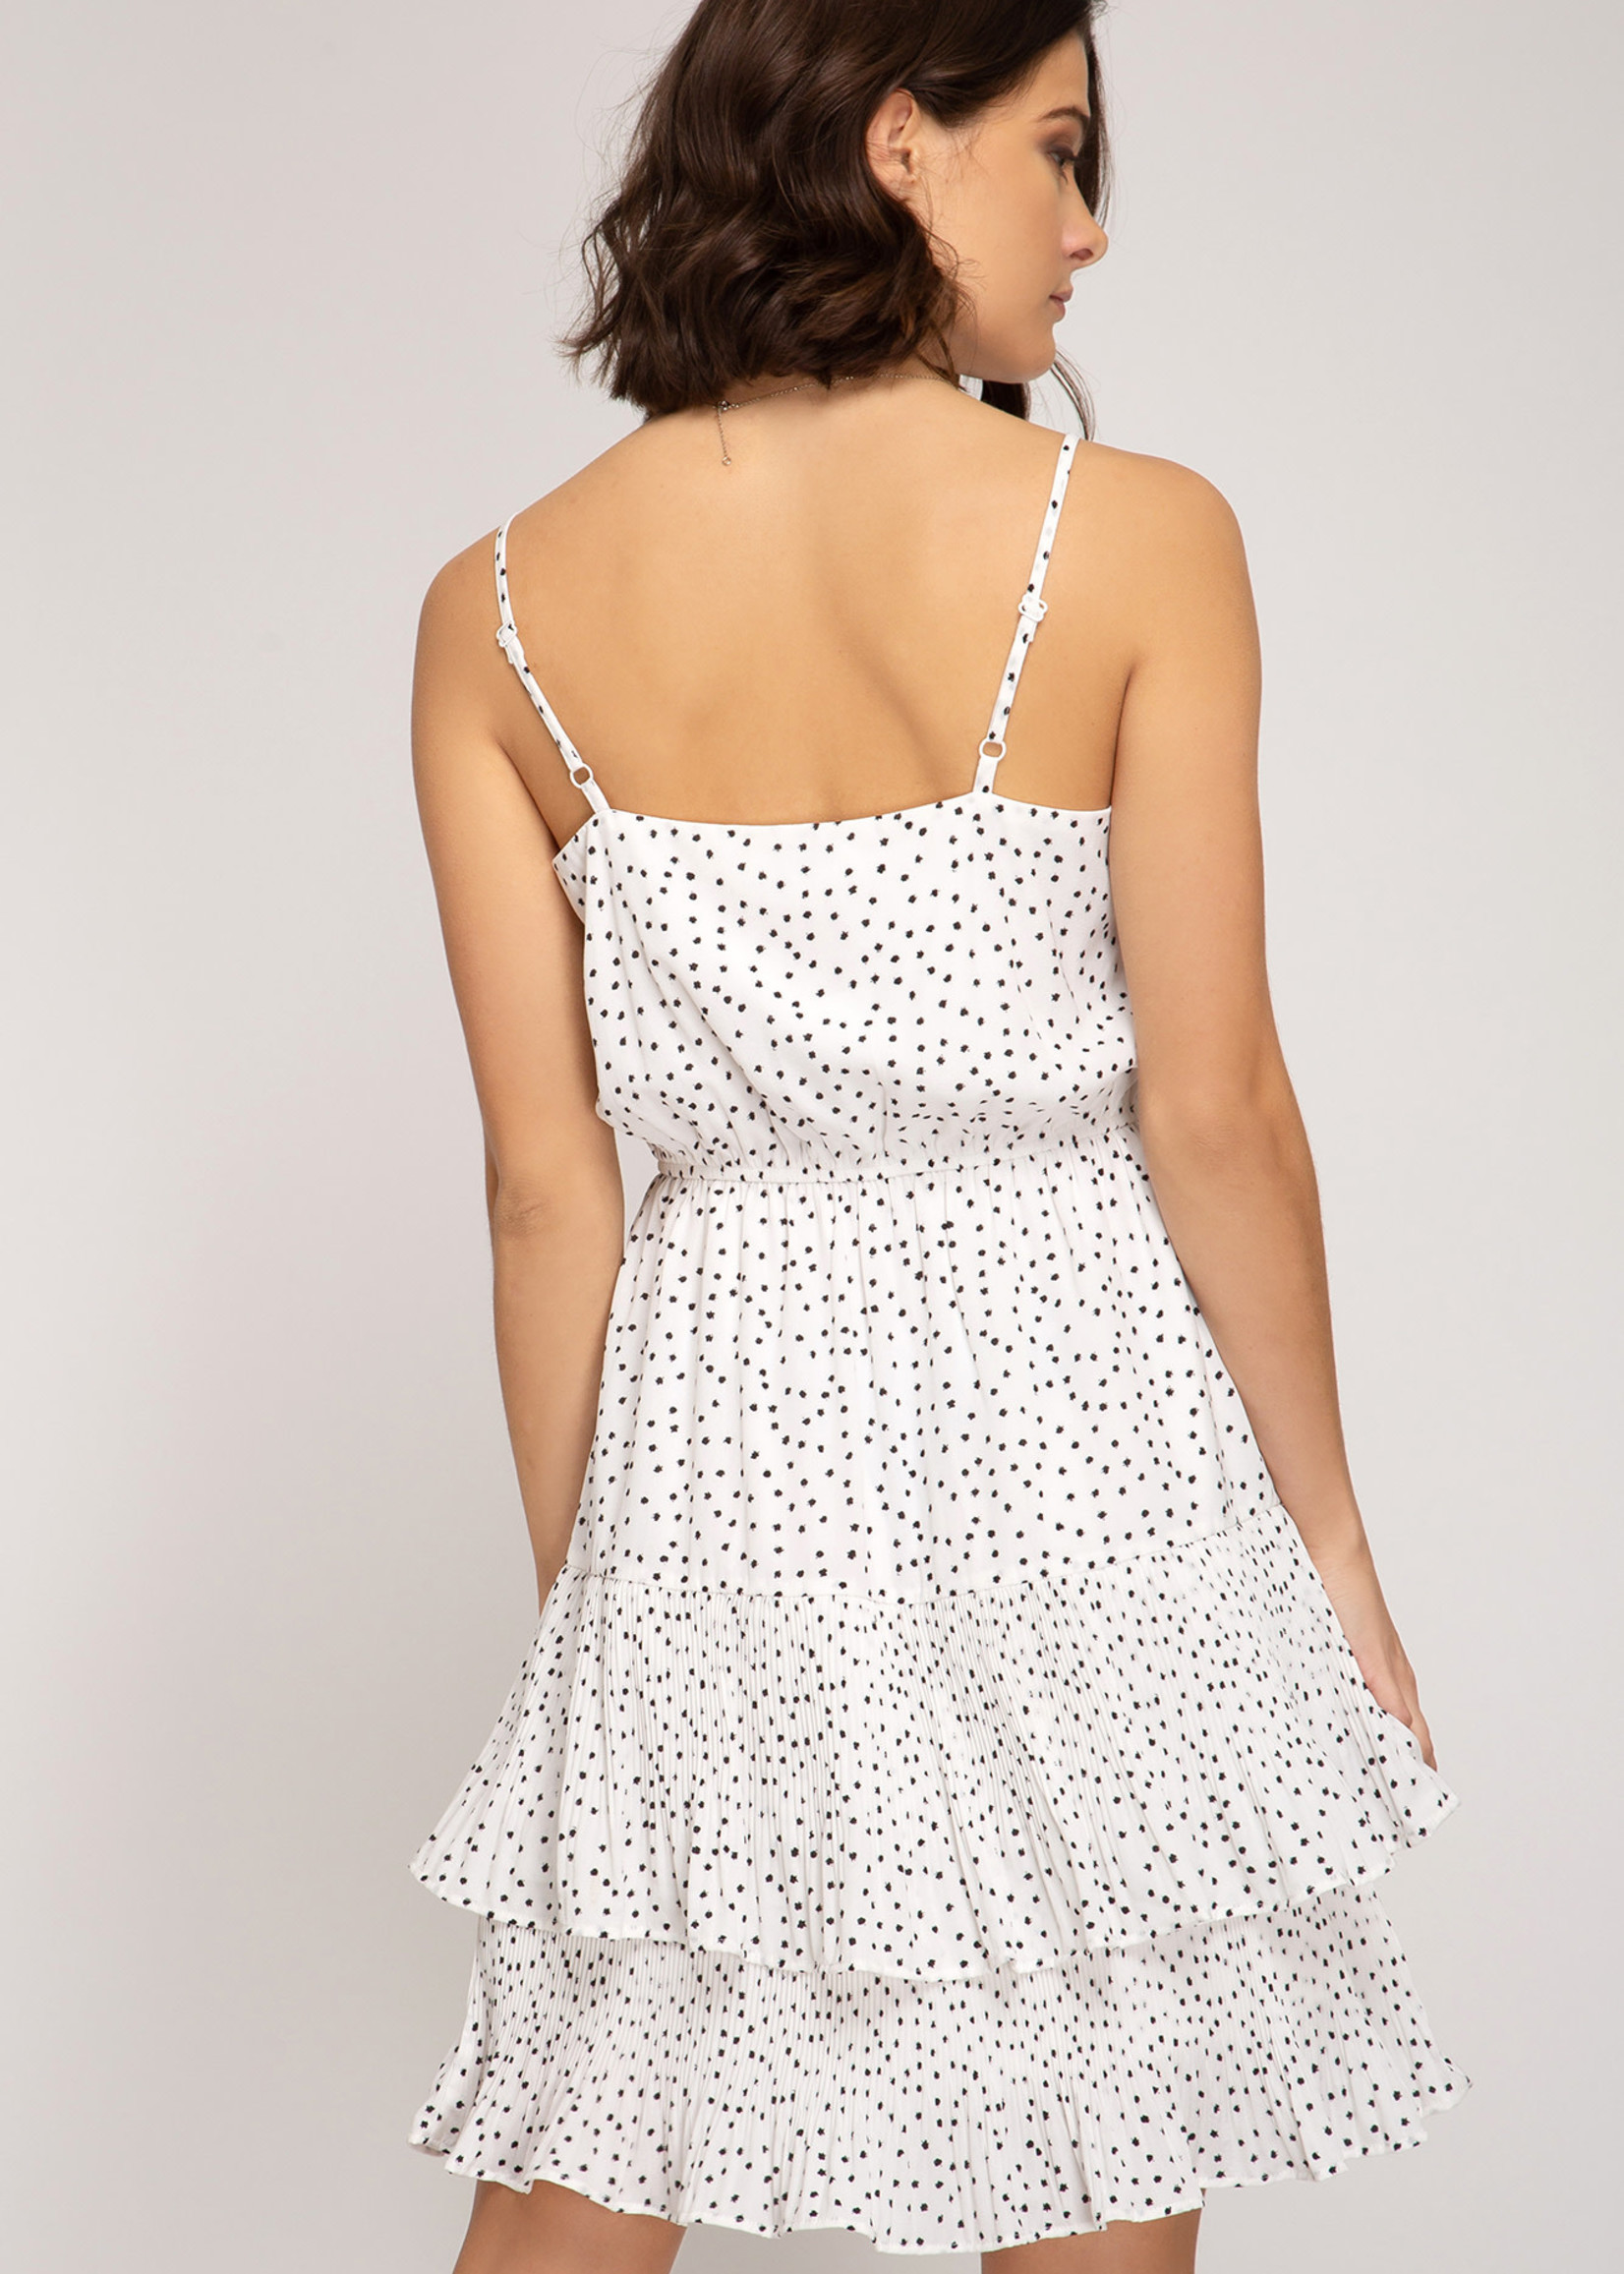 LeBLANC finds DOT cocktail dress